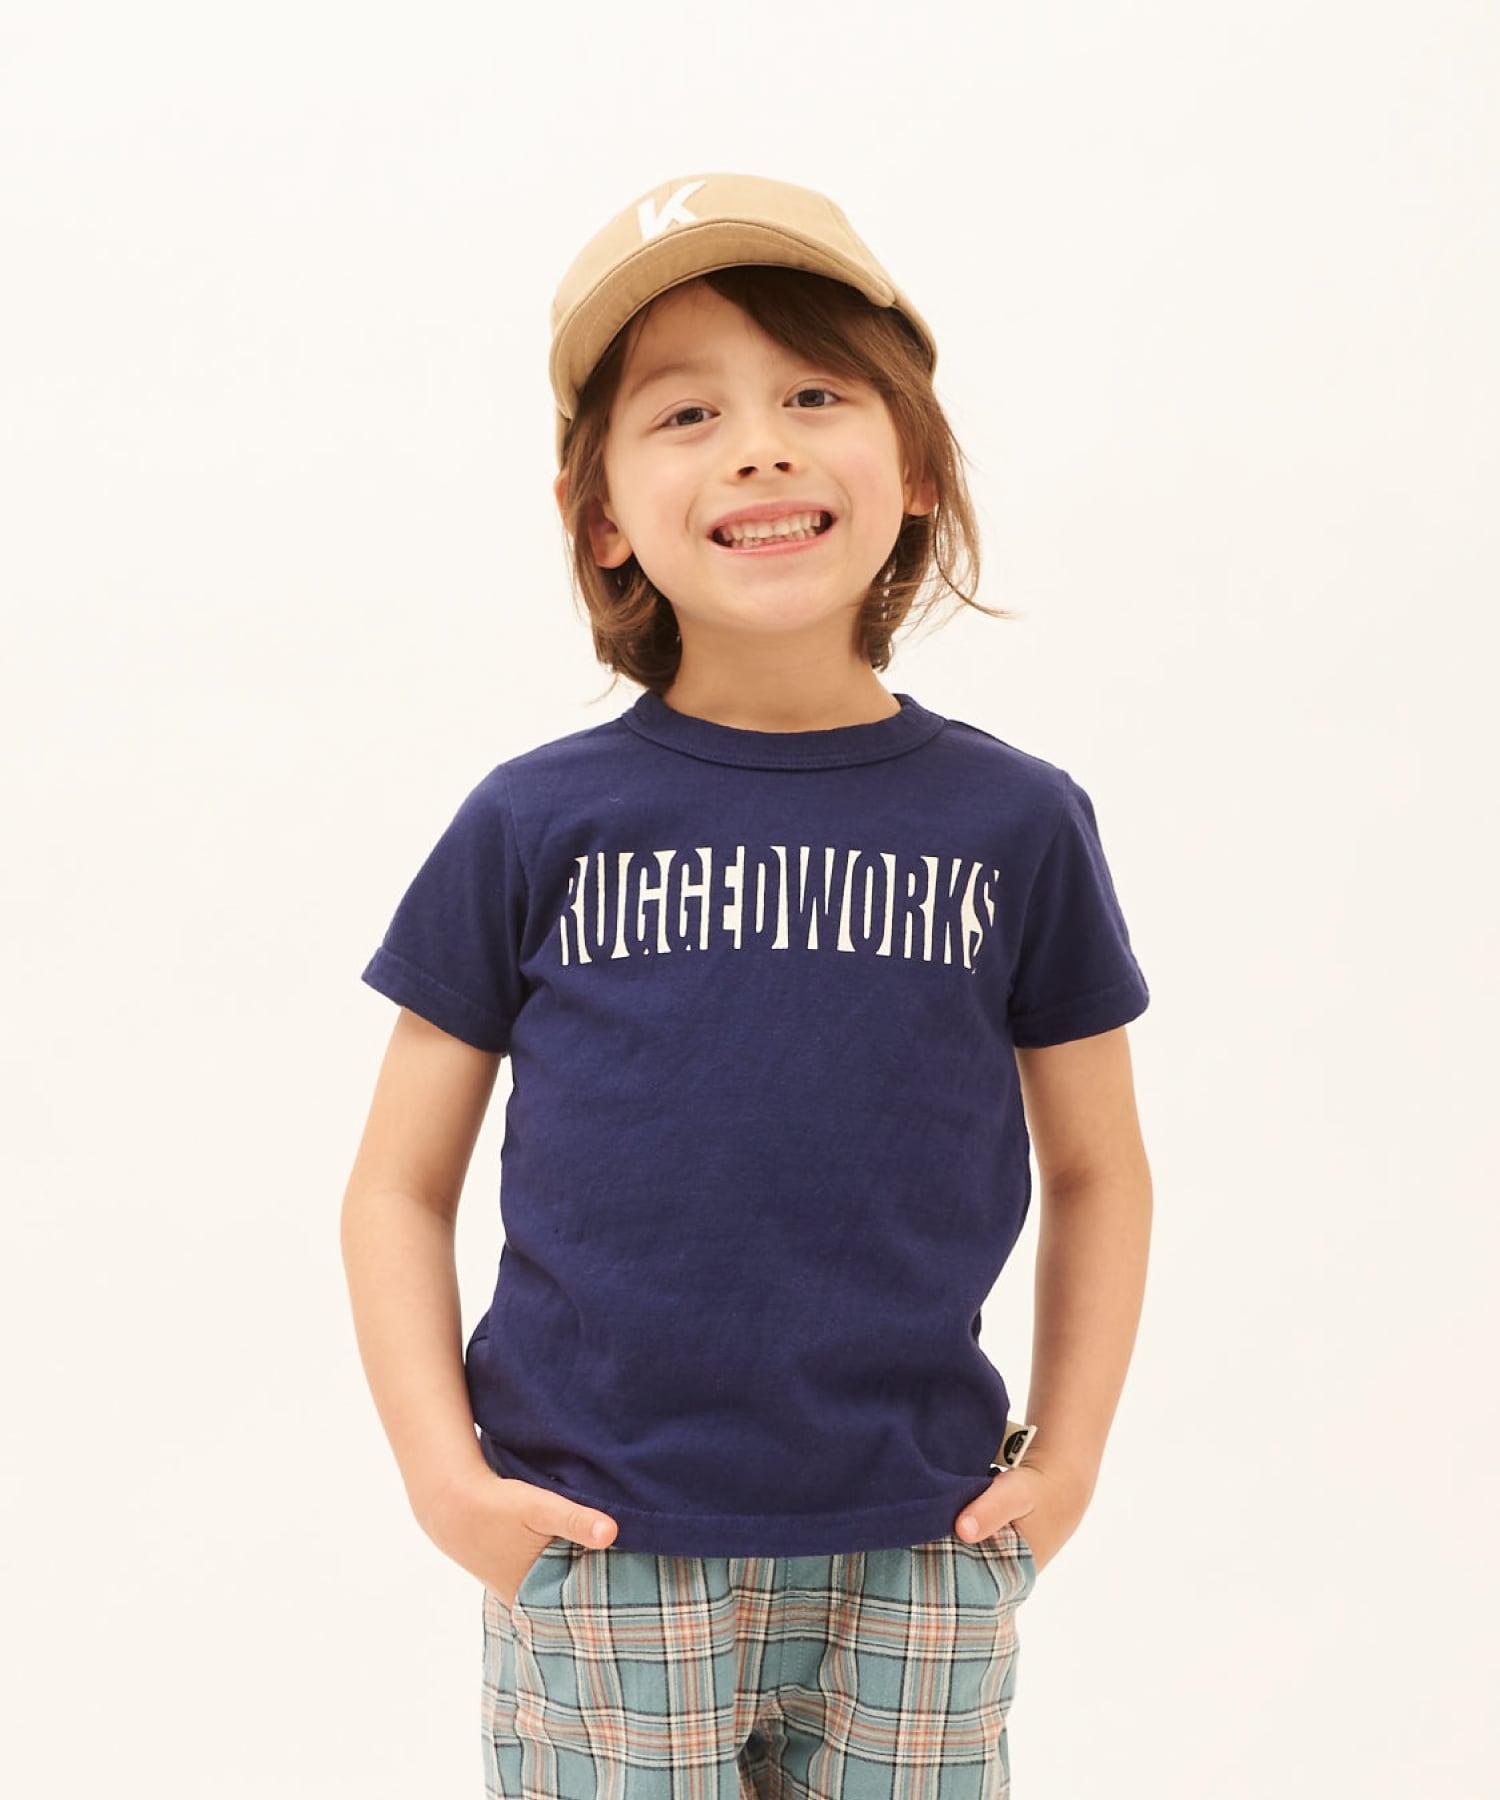 RUGGEDWORKSロゴ半袖TEE(日本製)